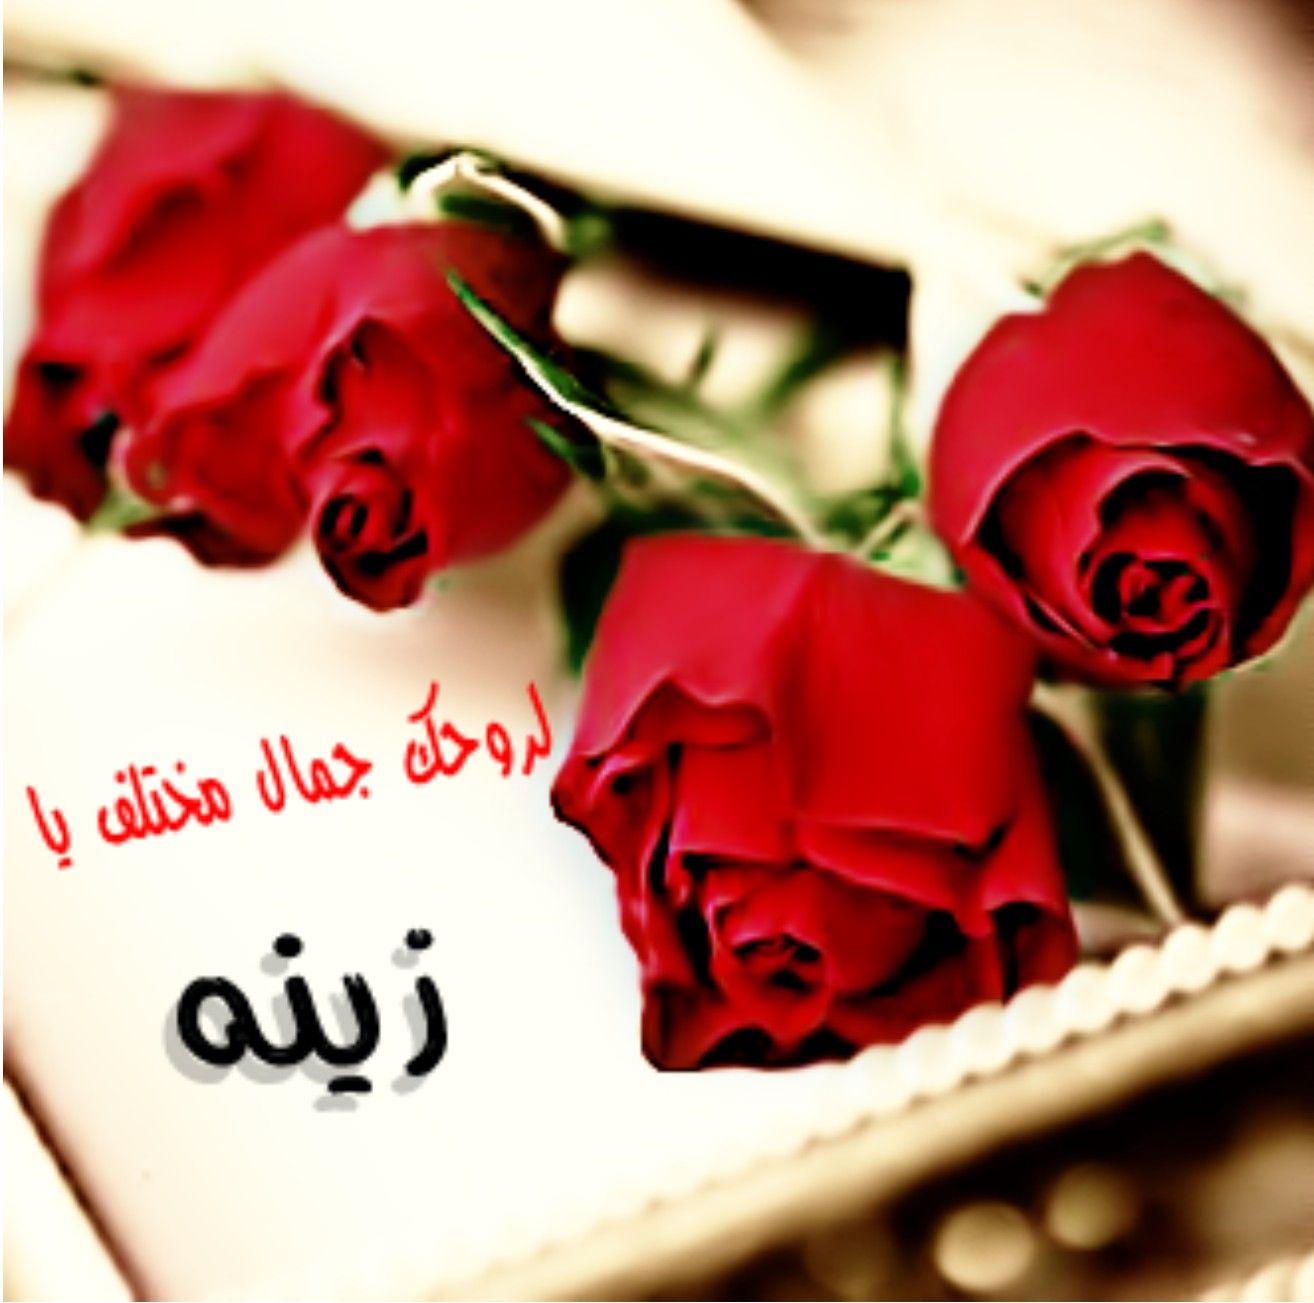 Pin By فلسطينية ولي الفخر On حروف أسماء واشكال مزخرفة Gift Wrapping Gifts Wallpaper